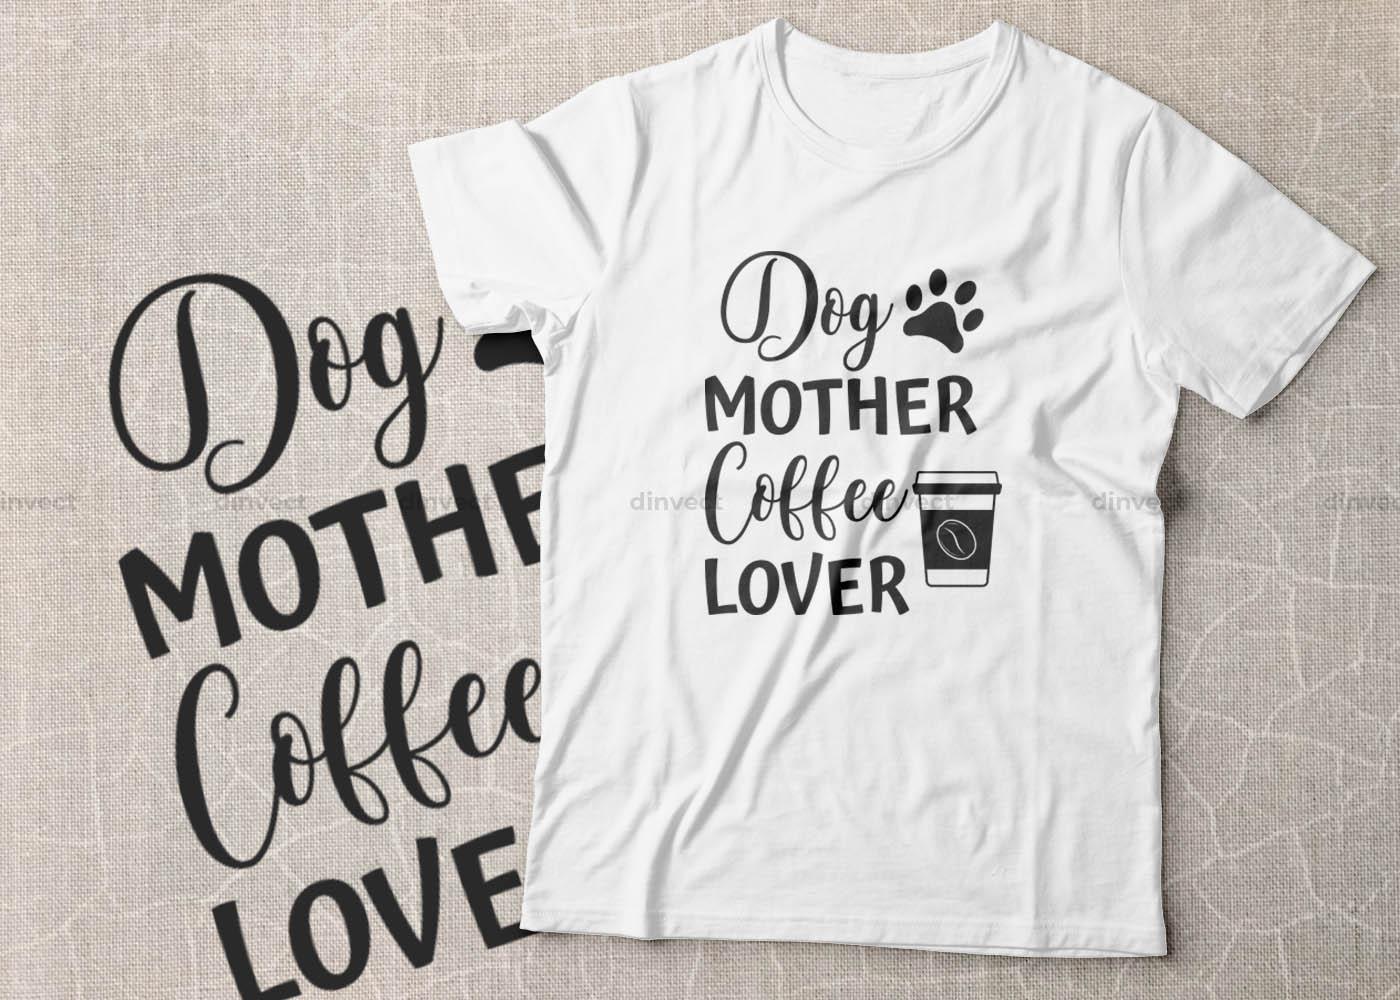 Coffee SVG, Coffee Bundle Svg, Coffee Mug Svg, Funny Coffee Quotes SVG, Mug Design Svg - Dog mother coffee lover 1 -